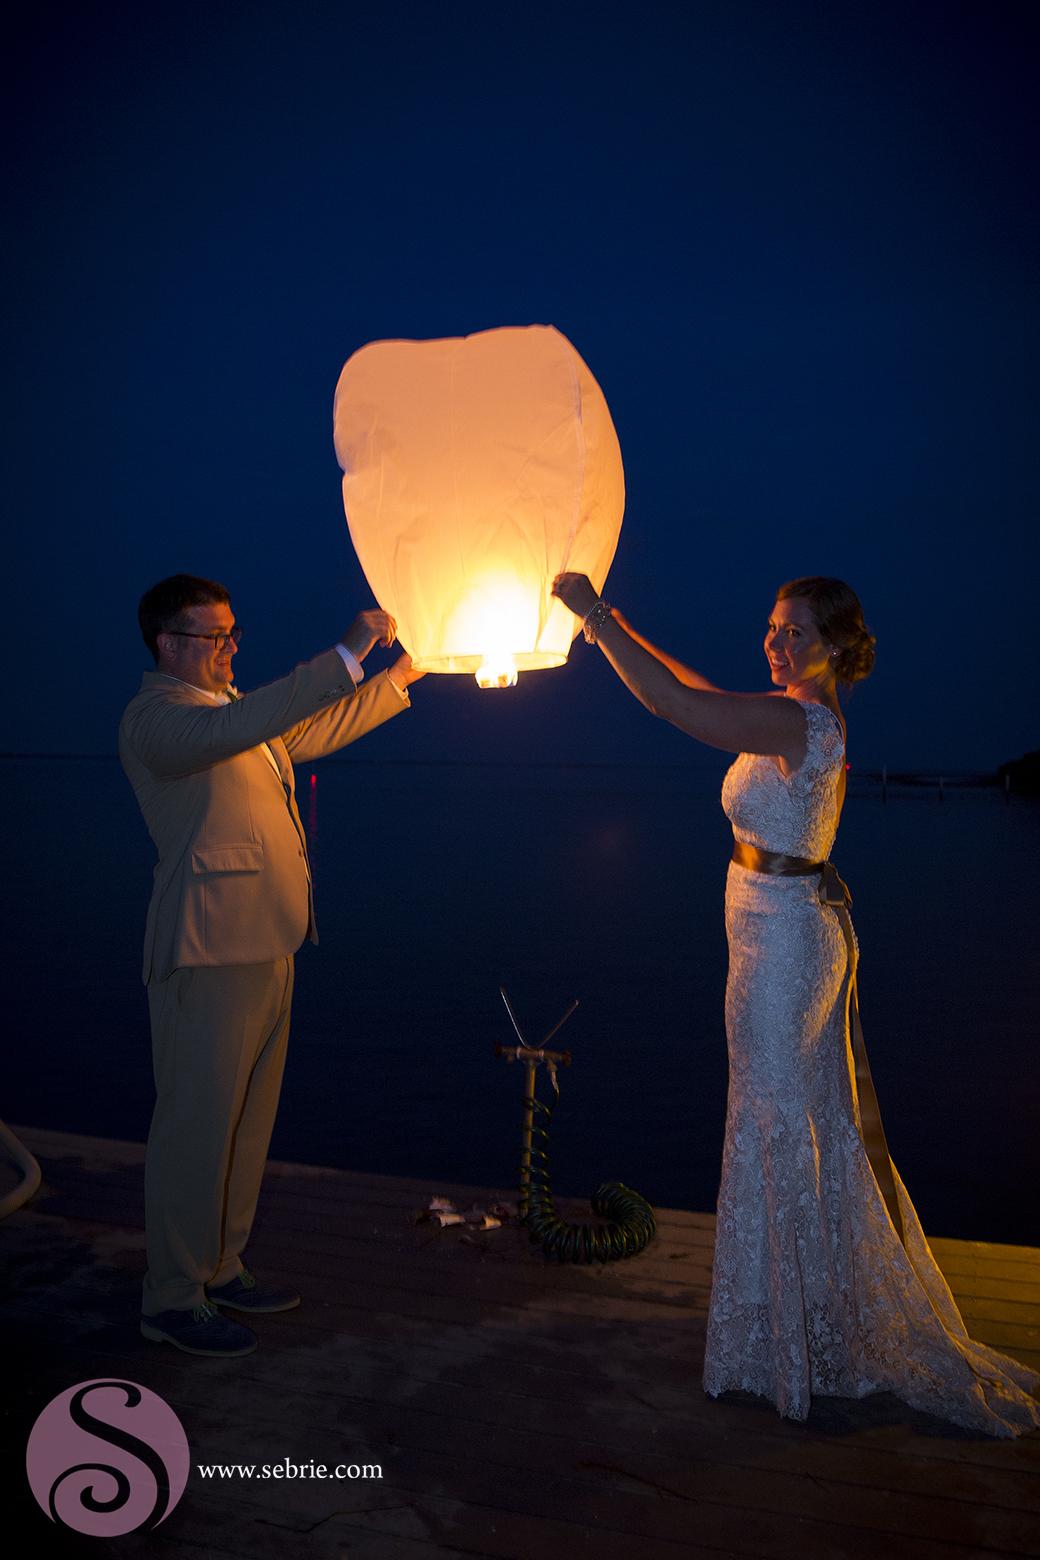 paper-lantern-photo